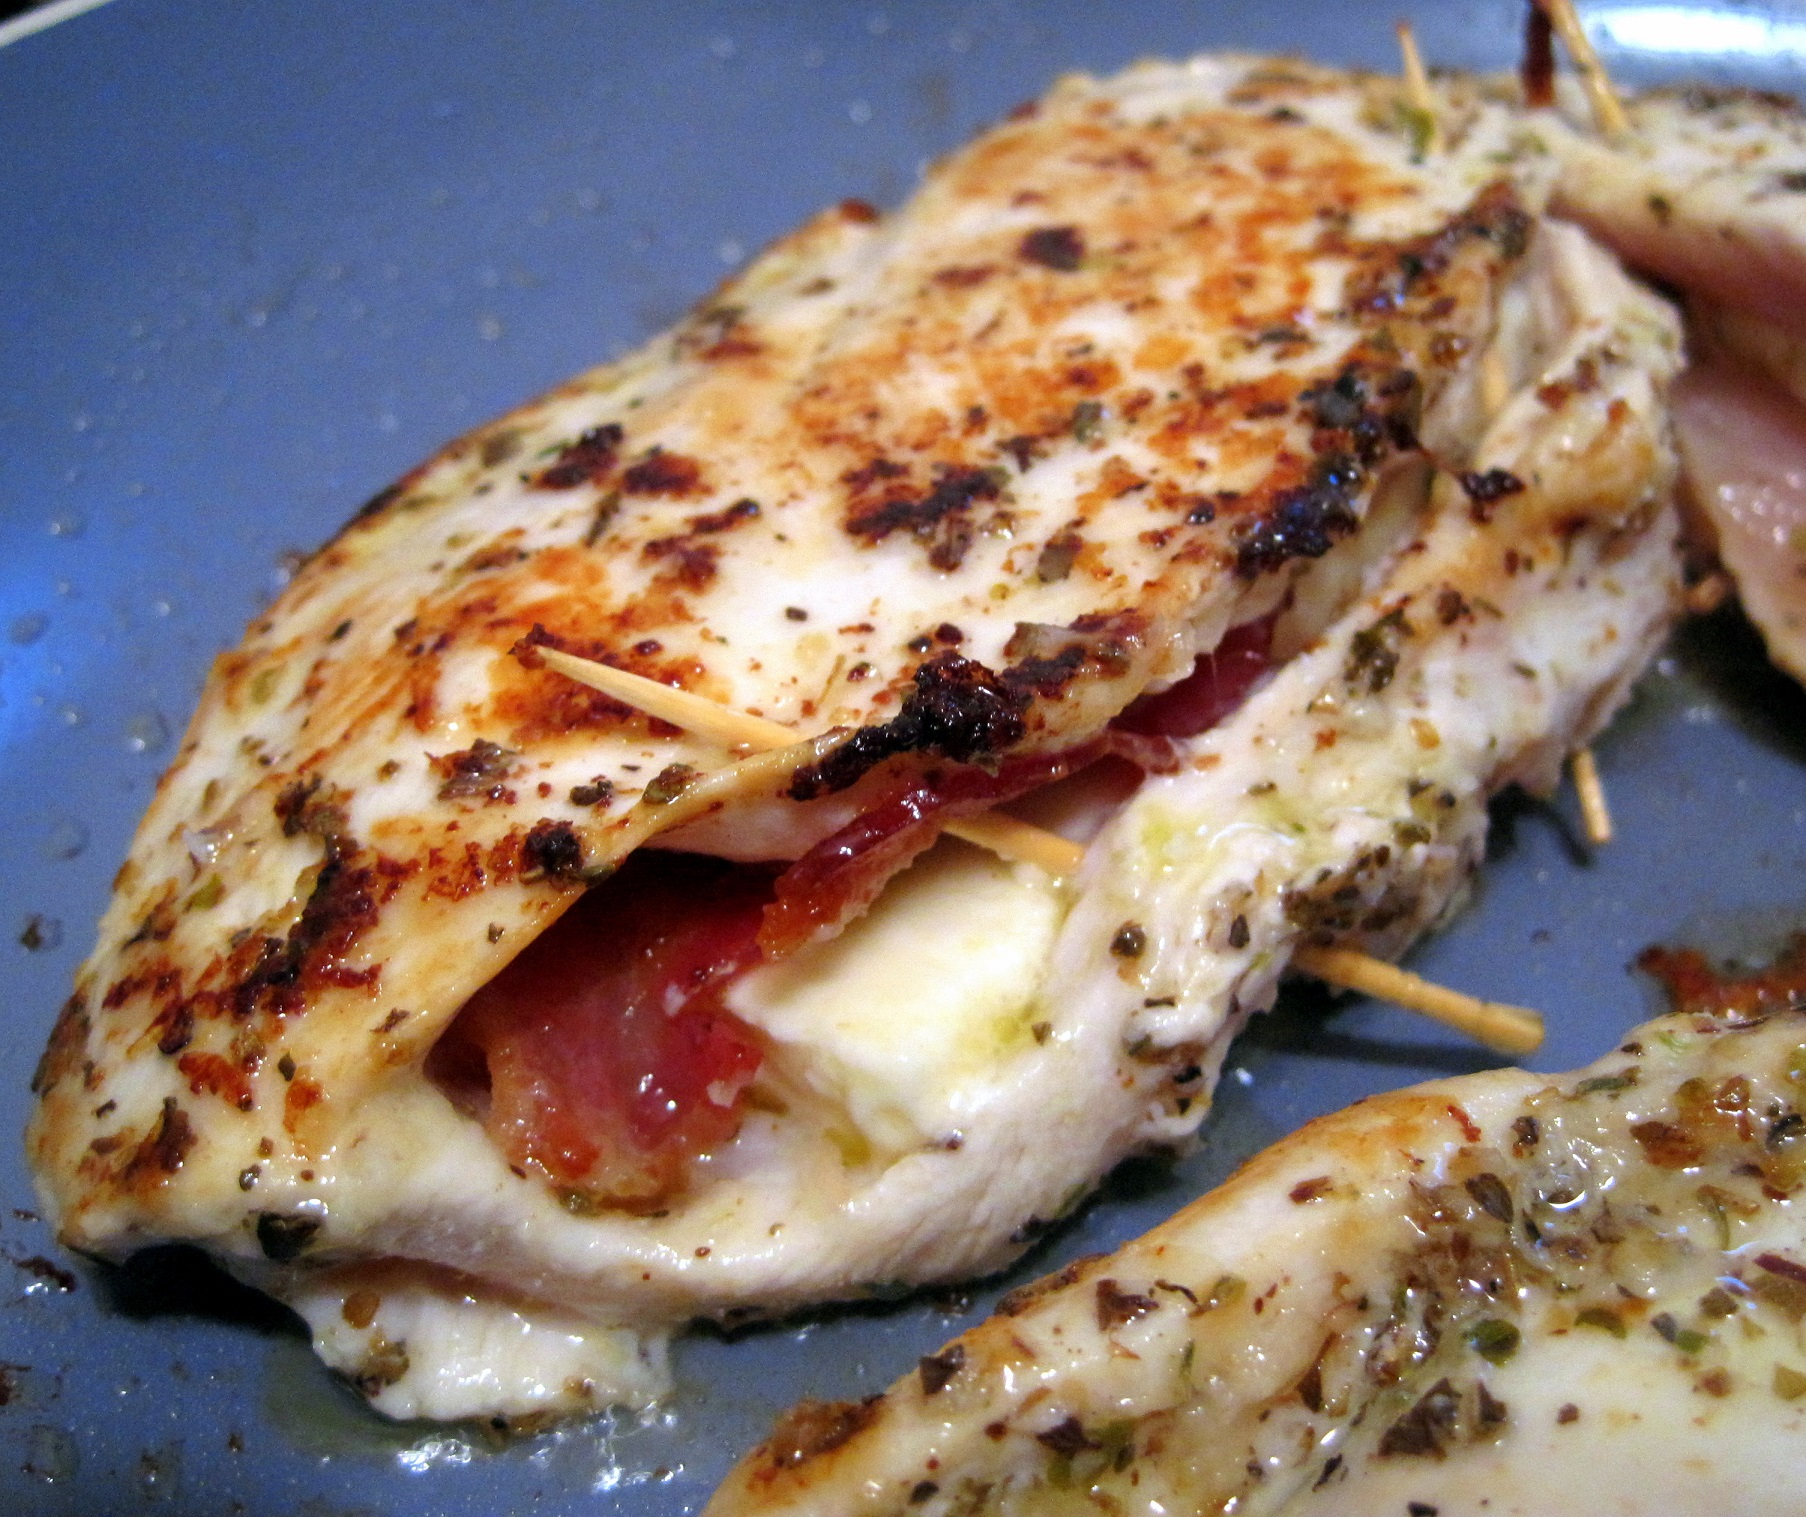 Feta Cheese And Bacon Stuffed Breasts Recipe — Dishmaps